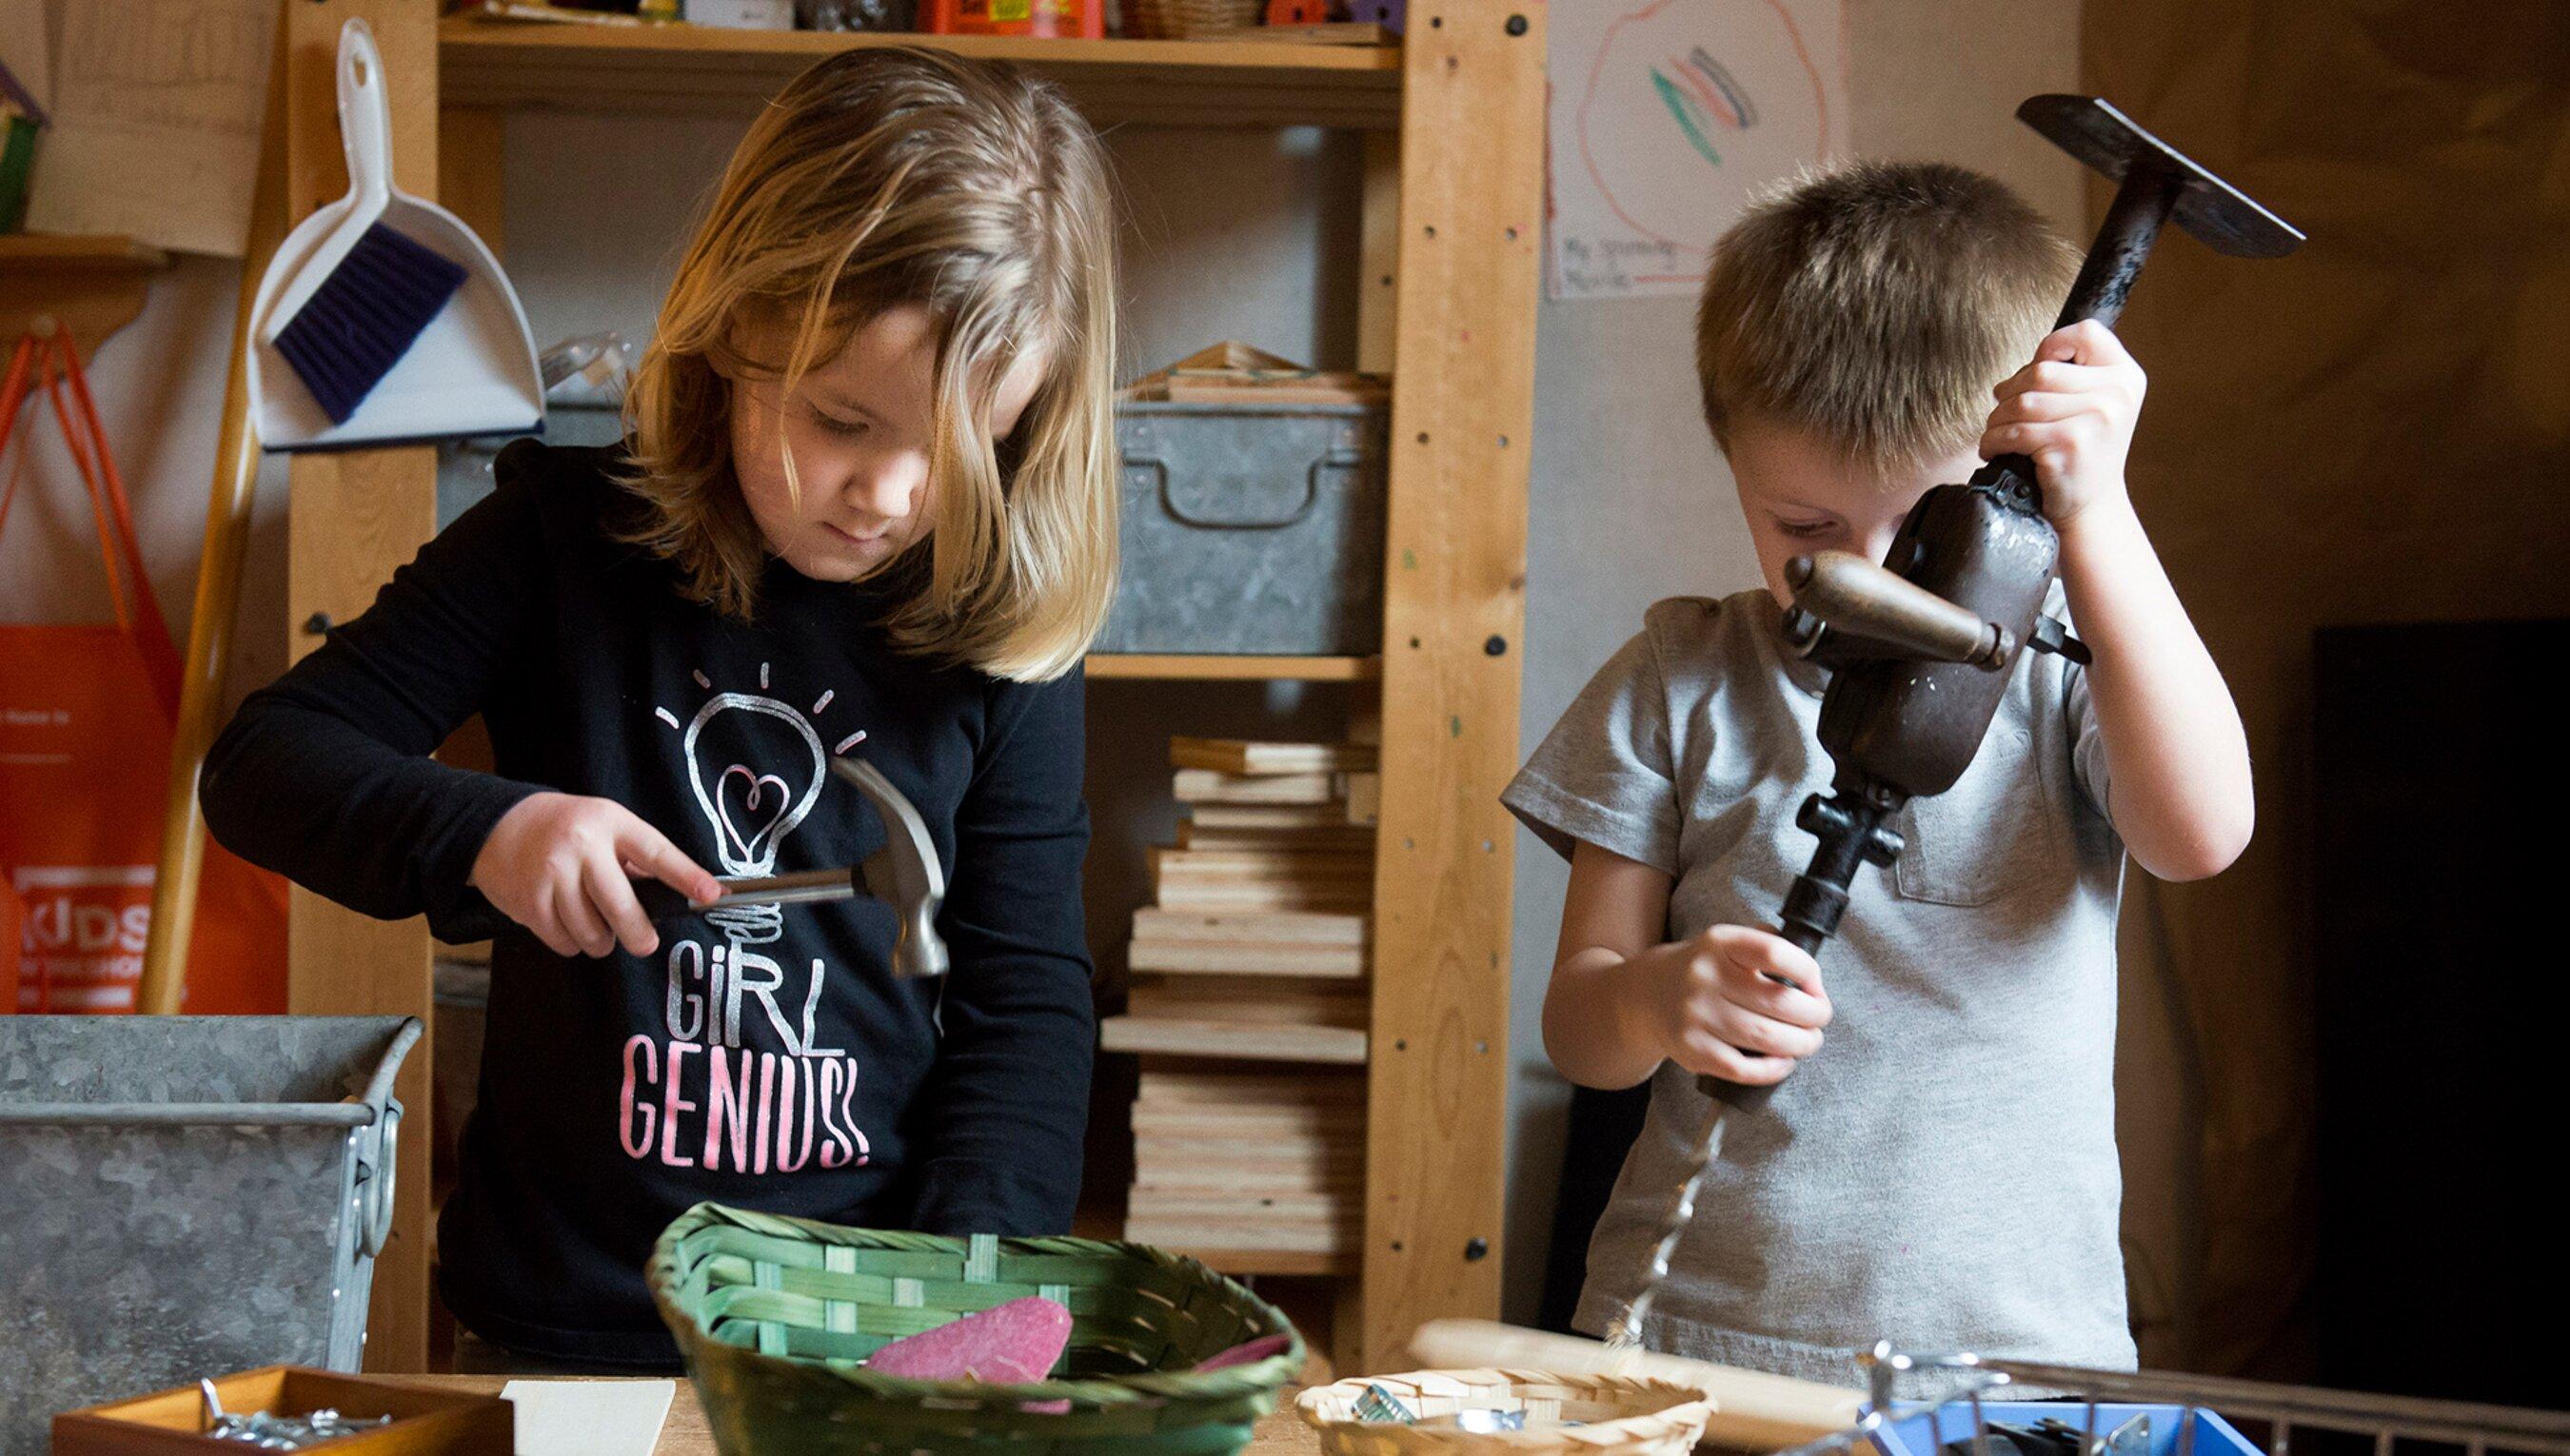 Handcraft lessons belong in a radical school curriculum | Psyche